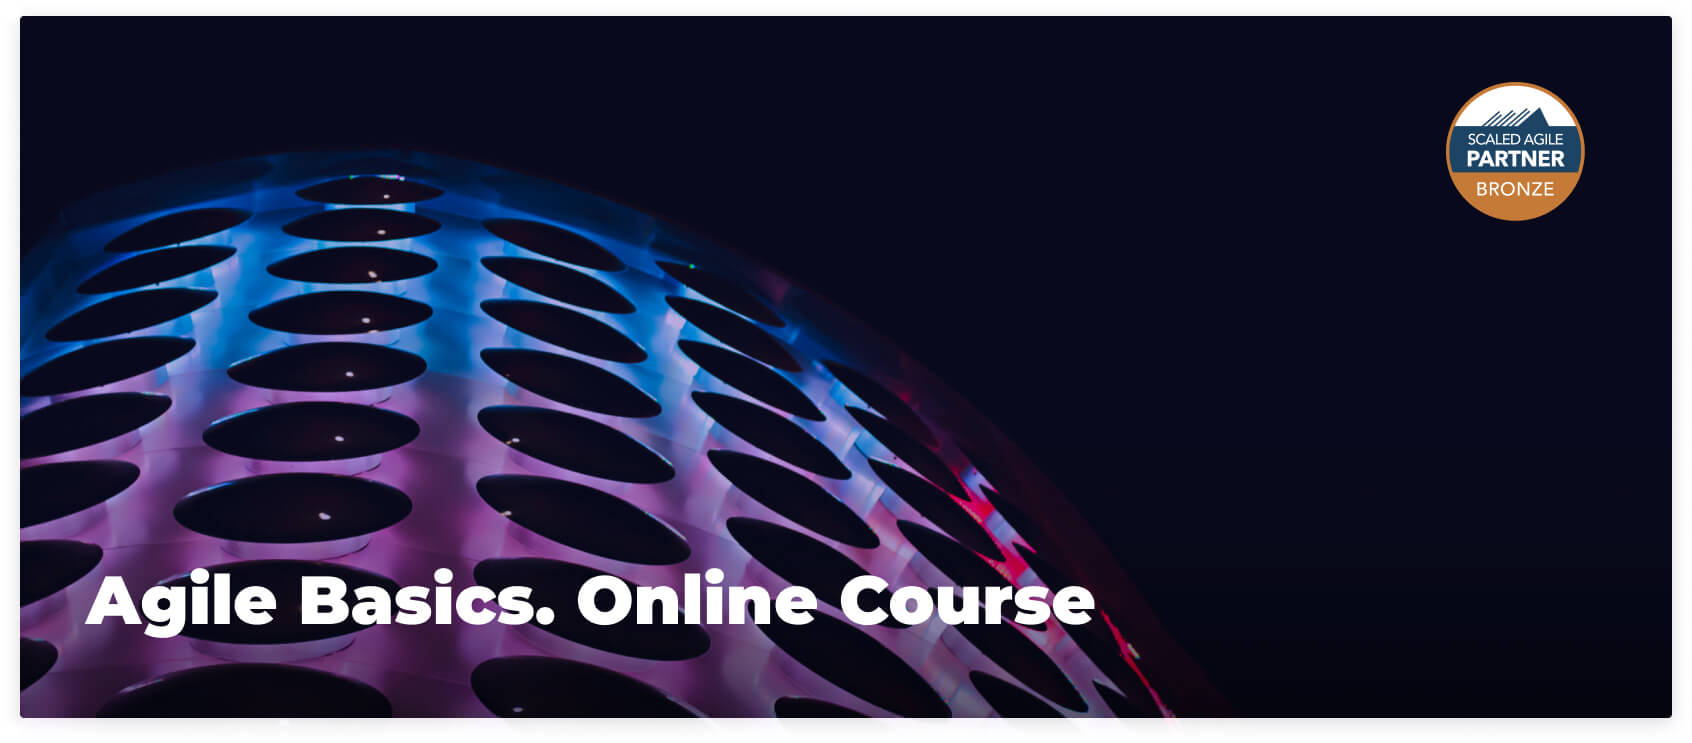 Agile Basics Online Course